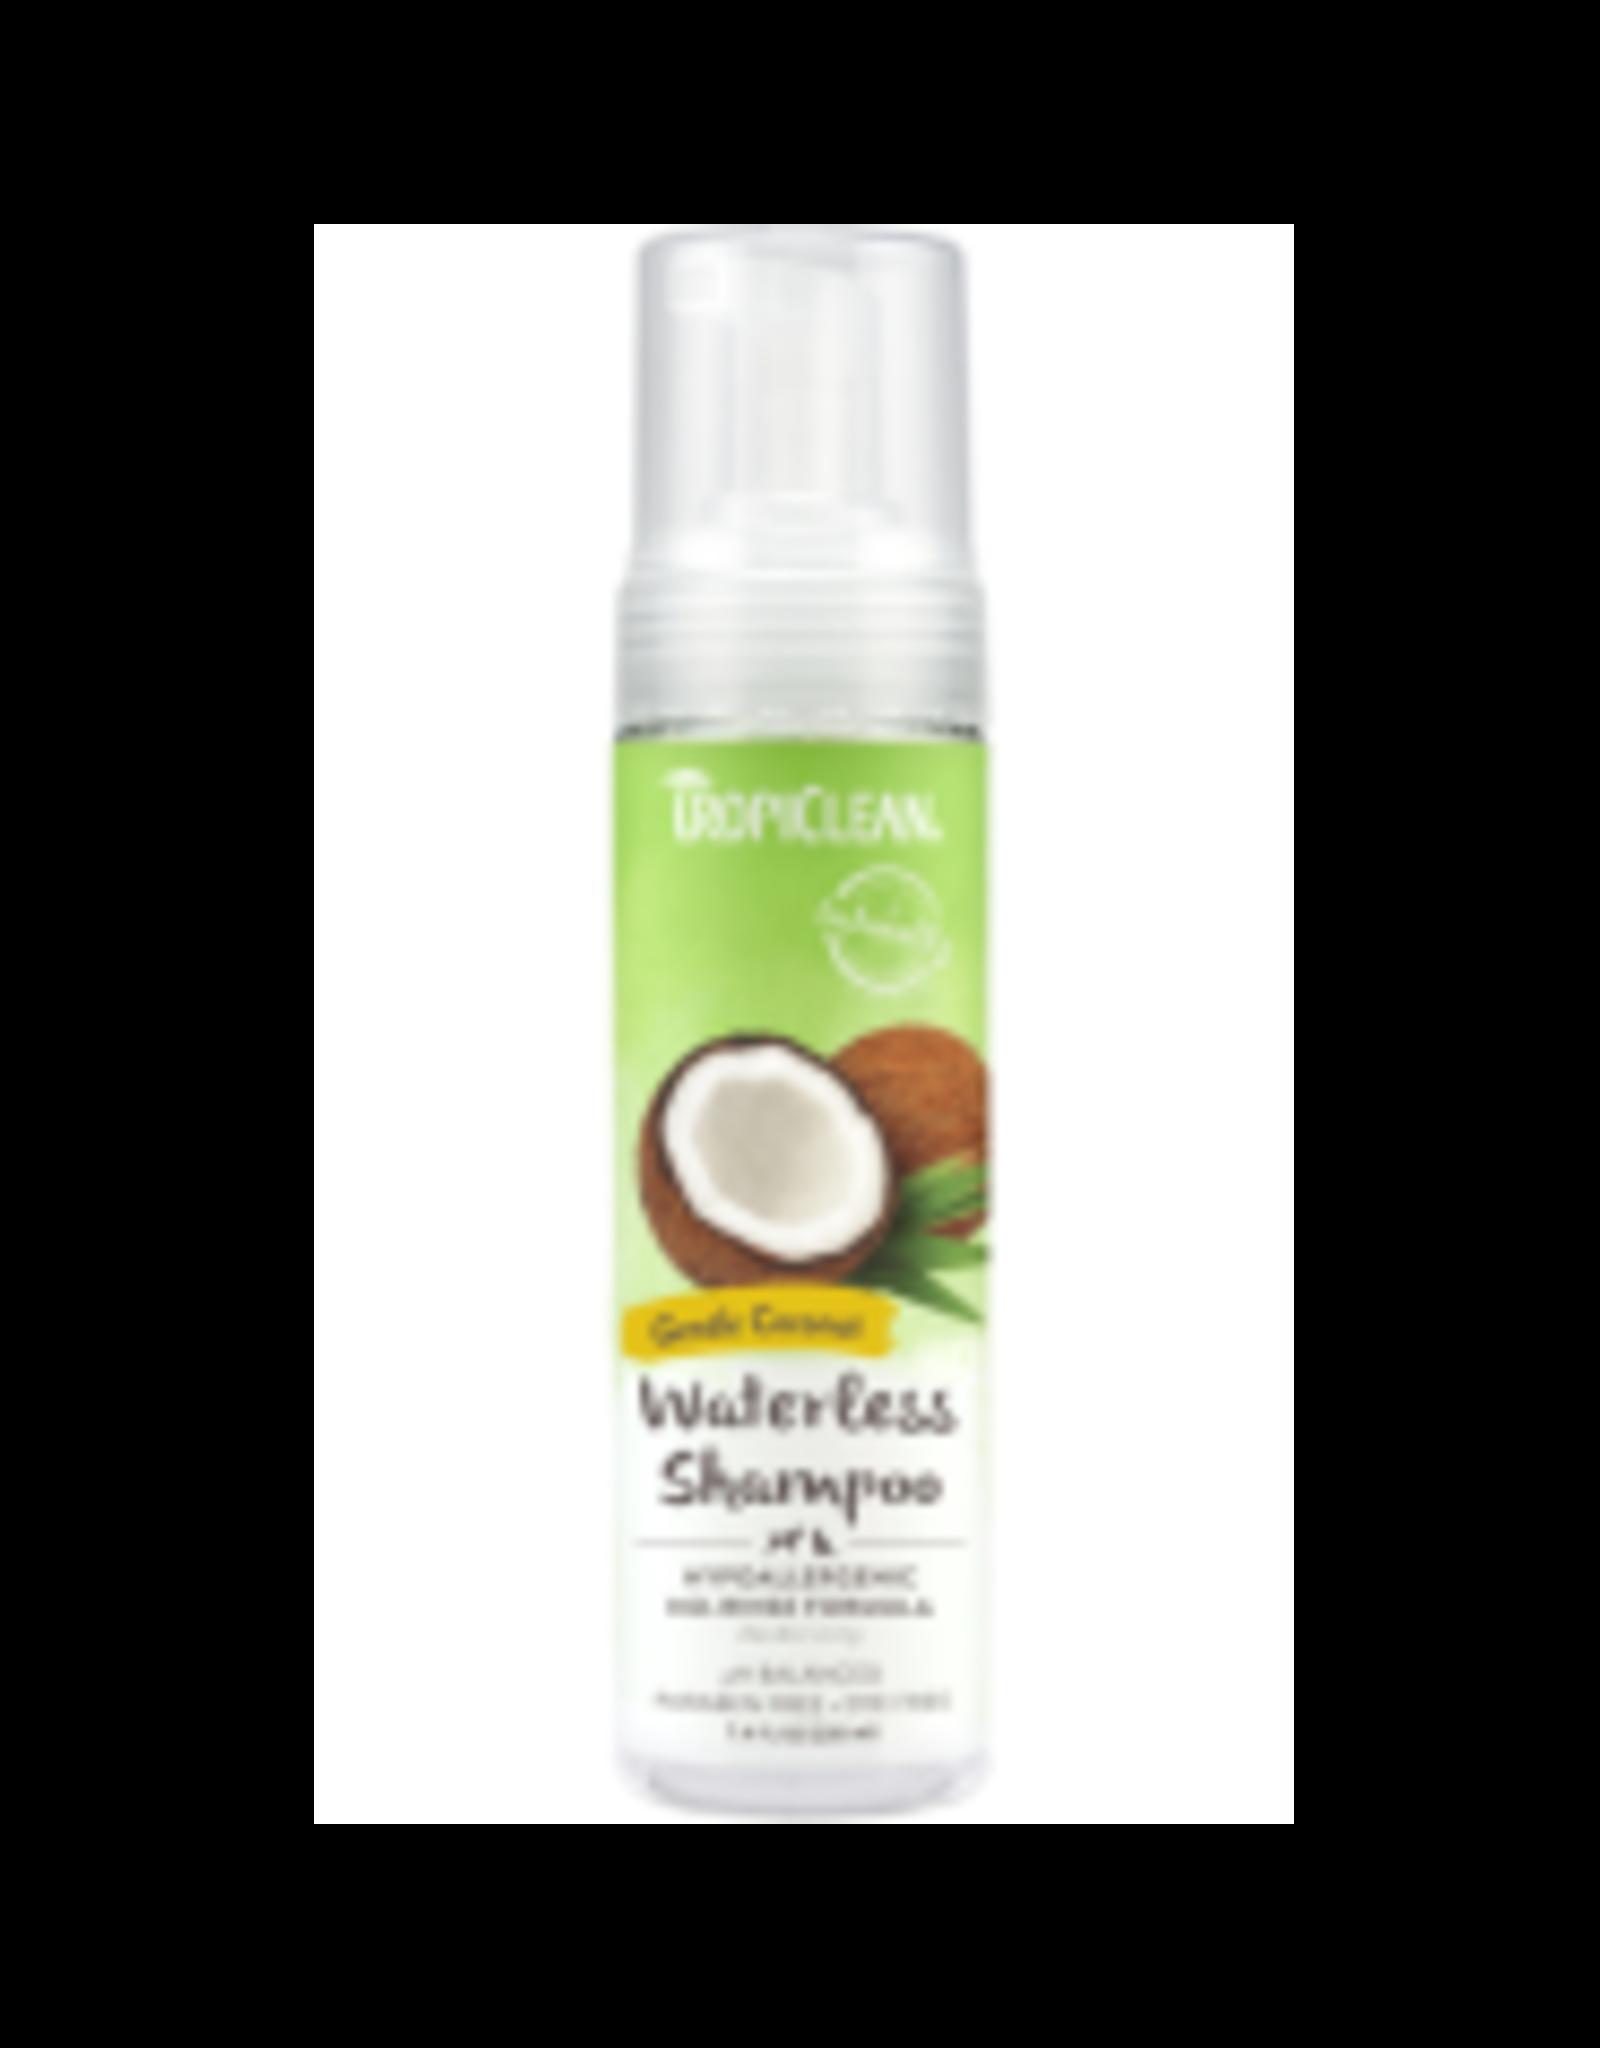 Tropiclean Tropiclean - Waterless Shampoo Hypoallergenic Gentle Coconut 7.4oz